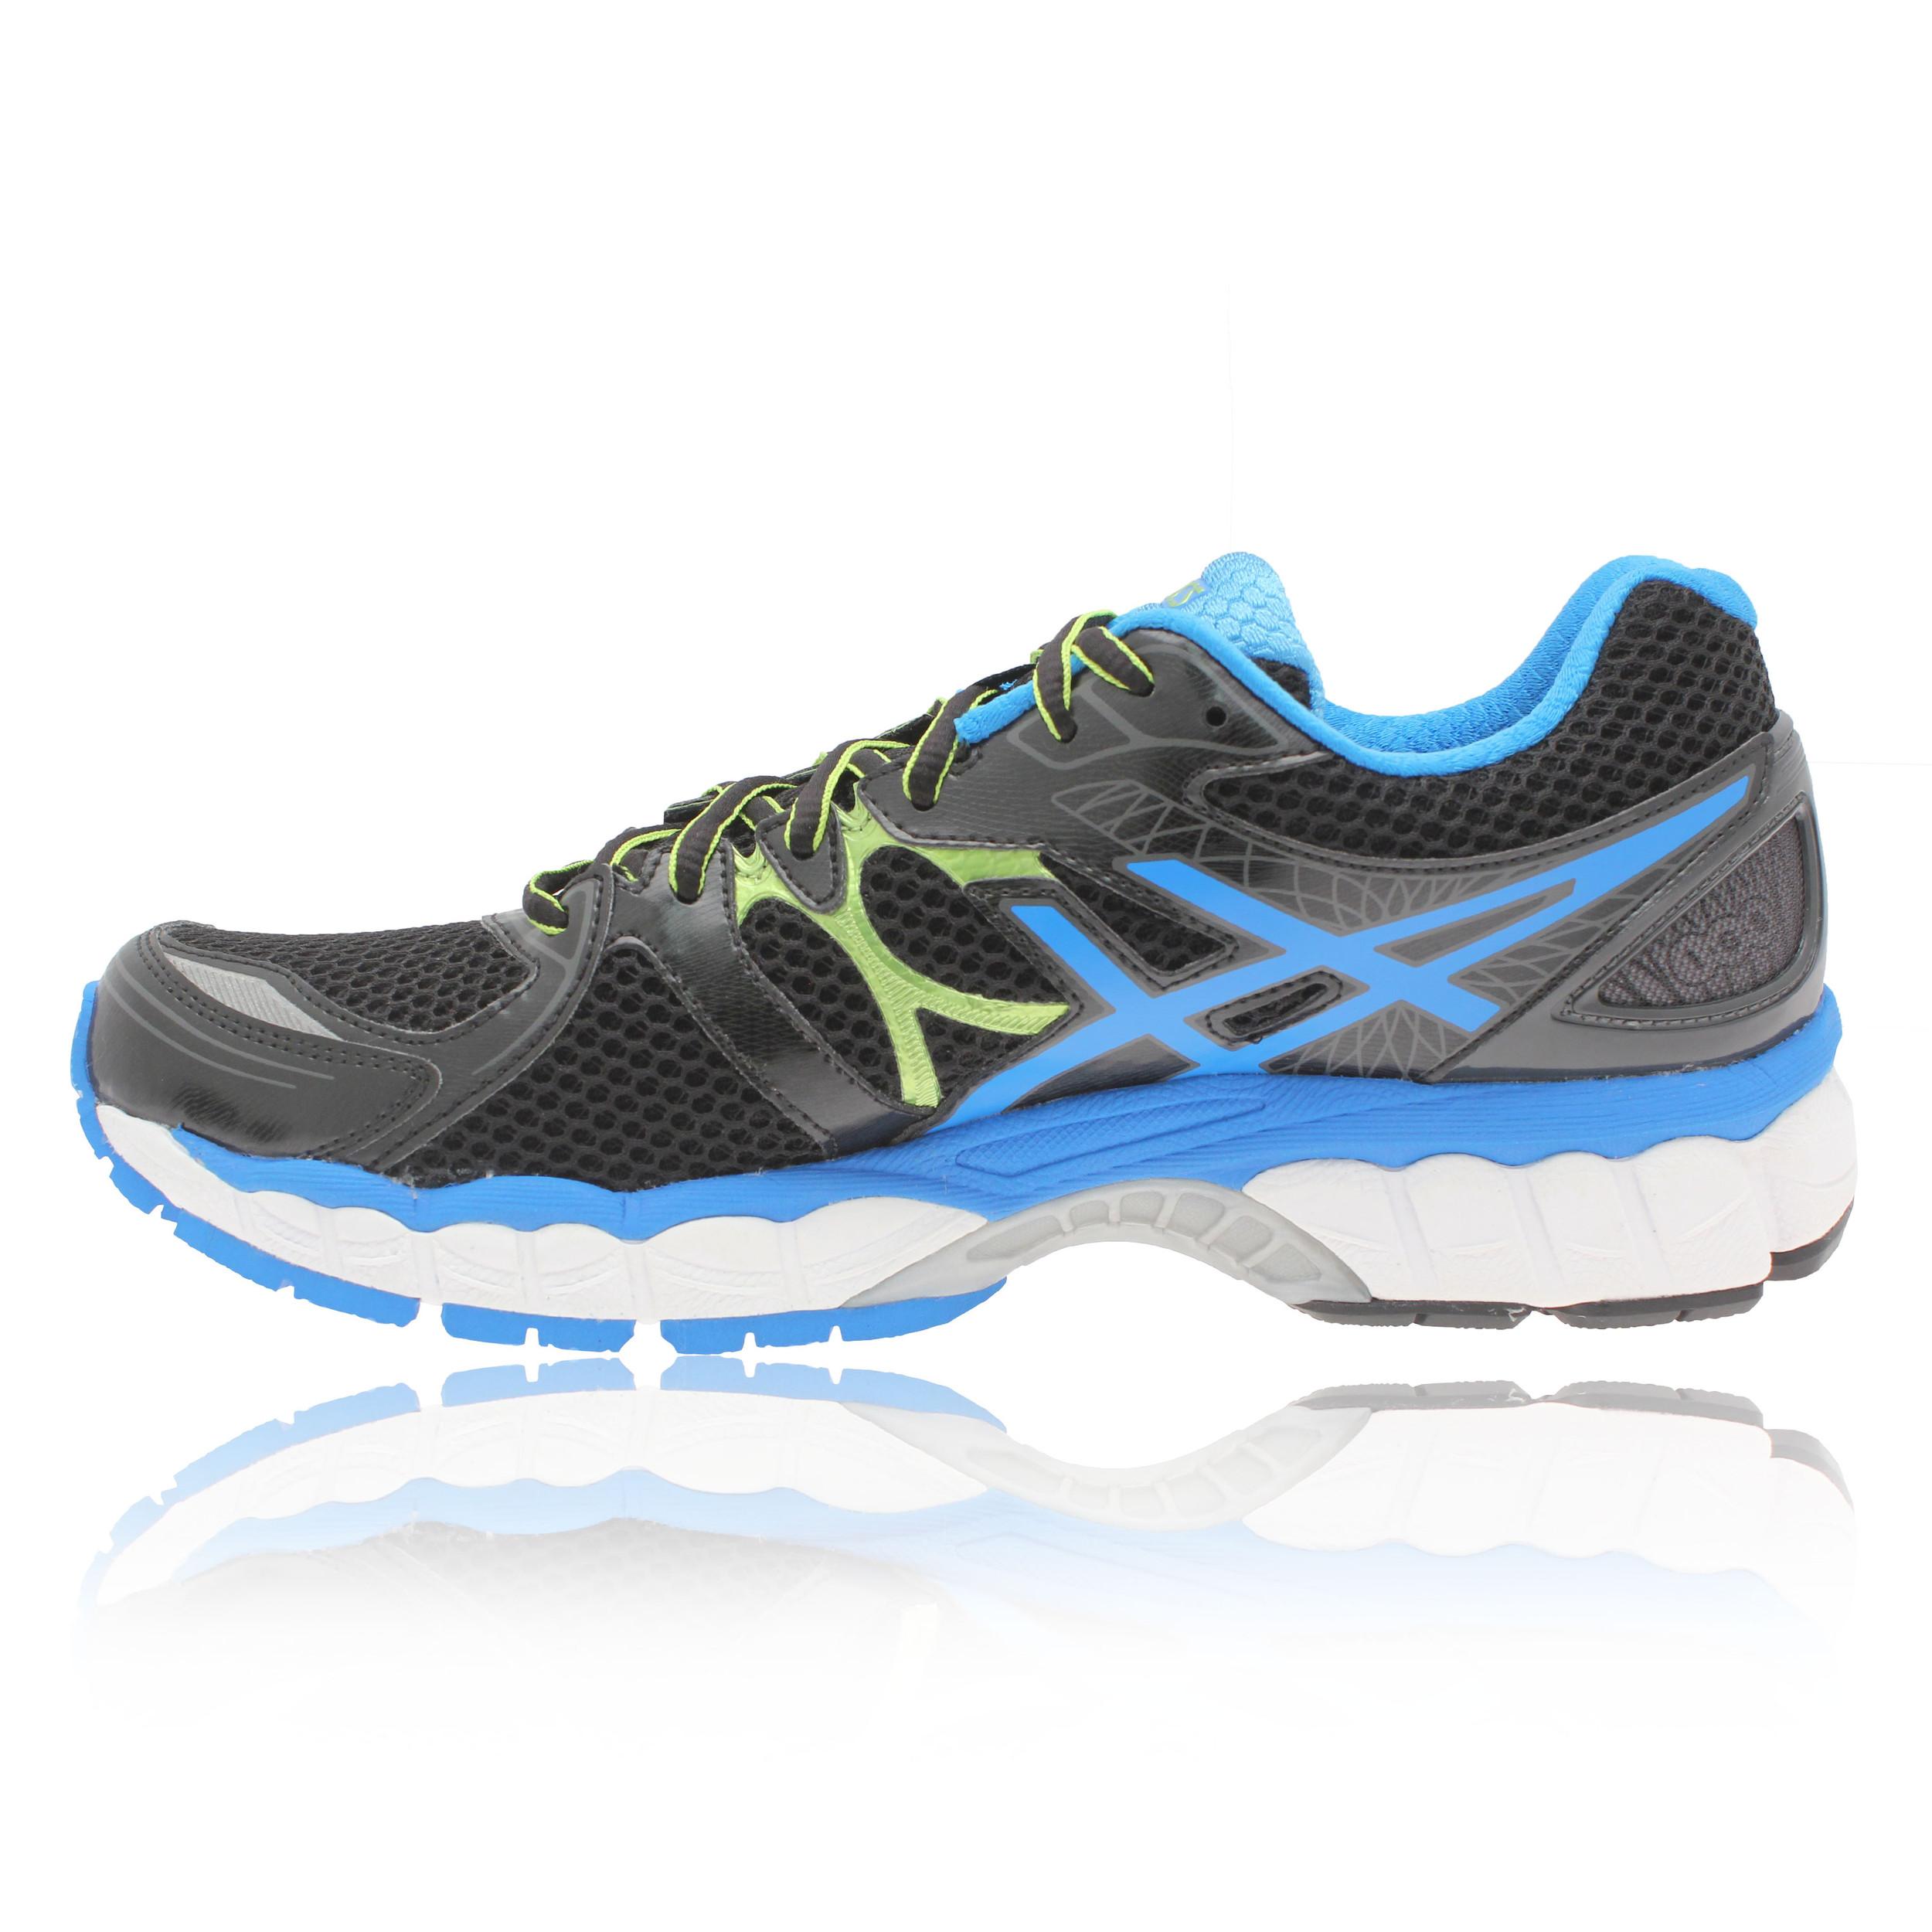 asics gel nimbus 16 running shoes 31 off. Black Bedroom Furniture Sets. Home Design Ideas